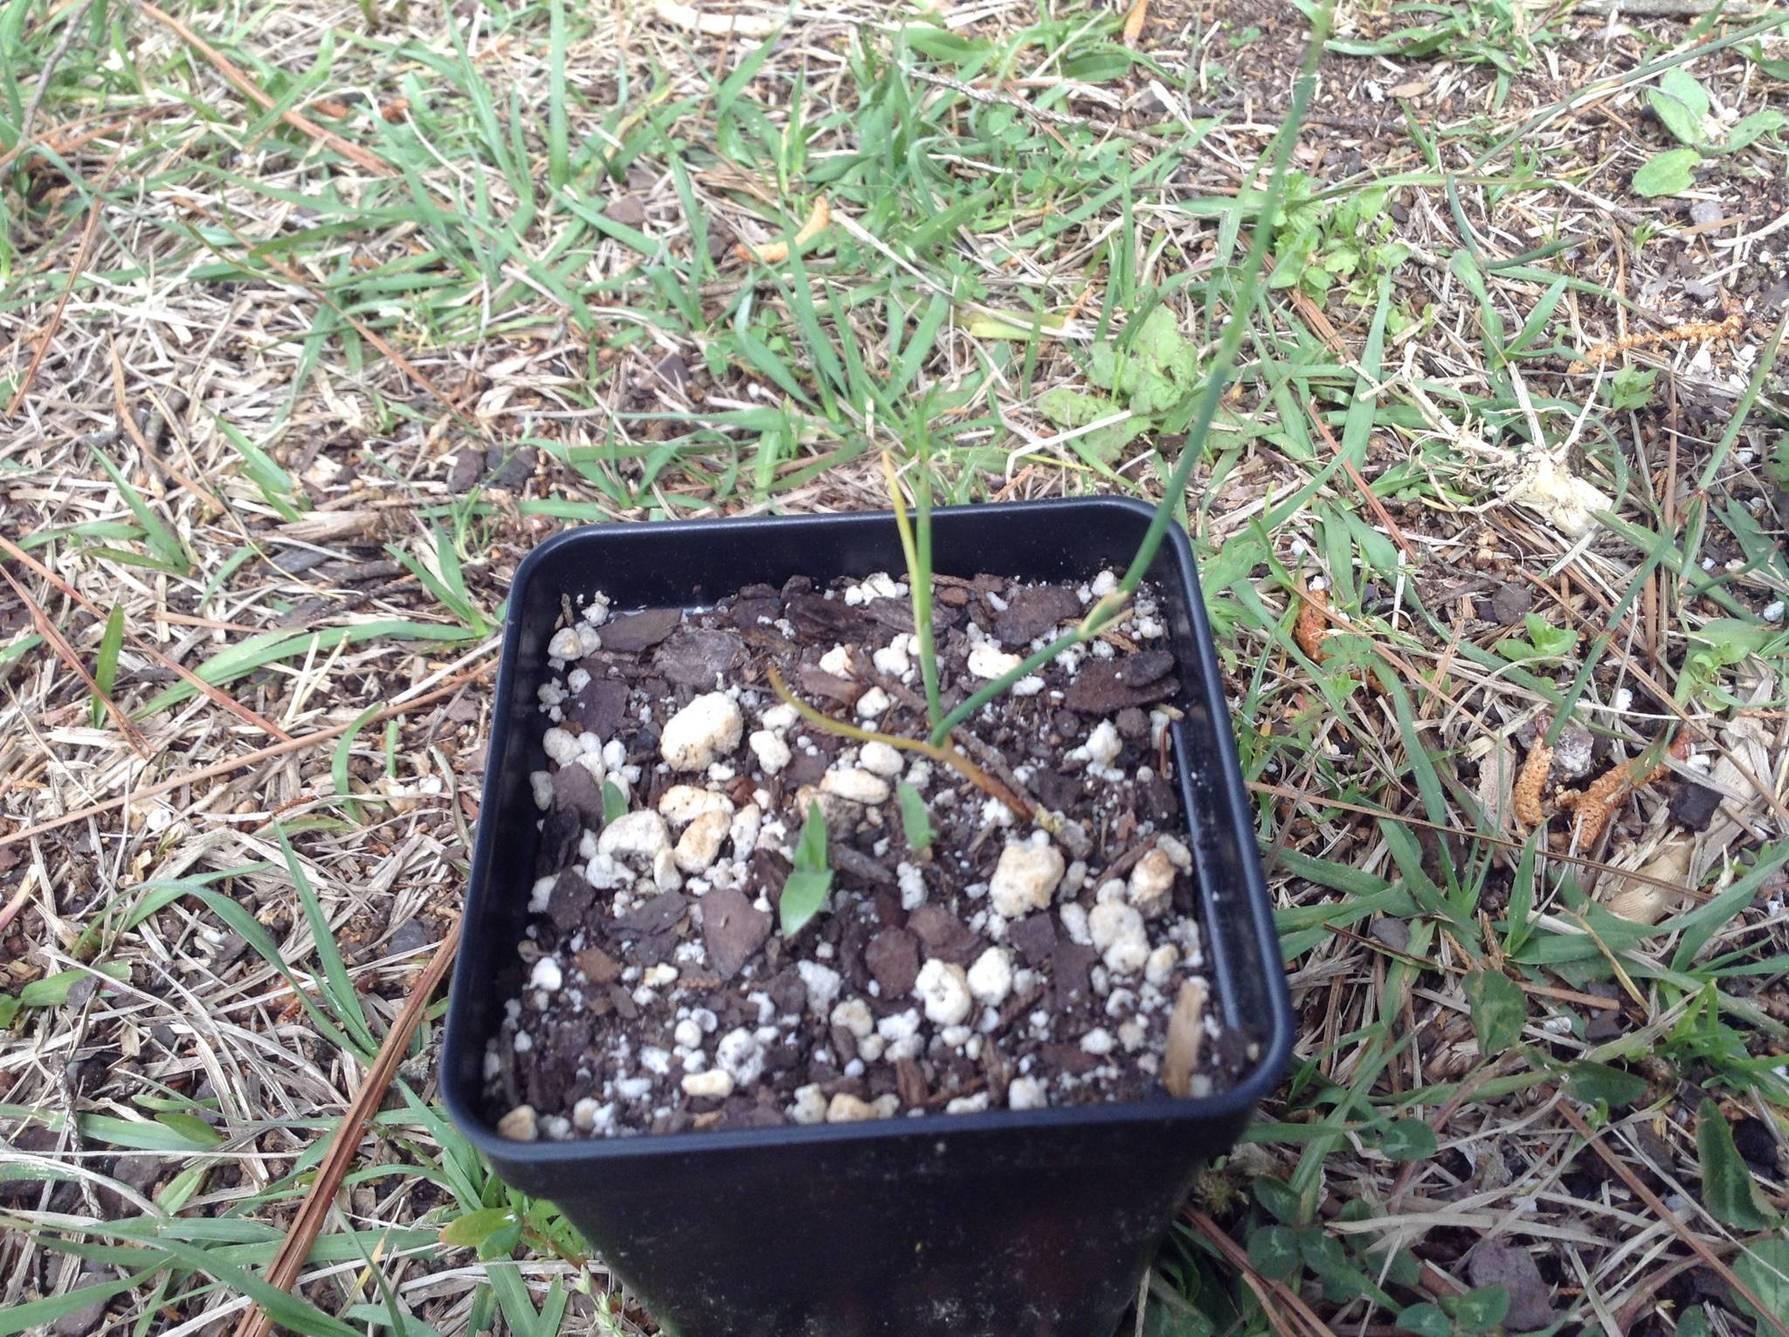 Ephedra sinica grown in water - The Ethnobotanical Garden